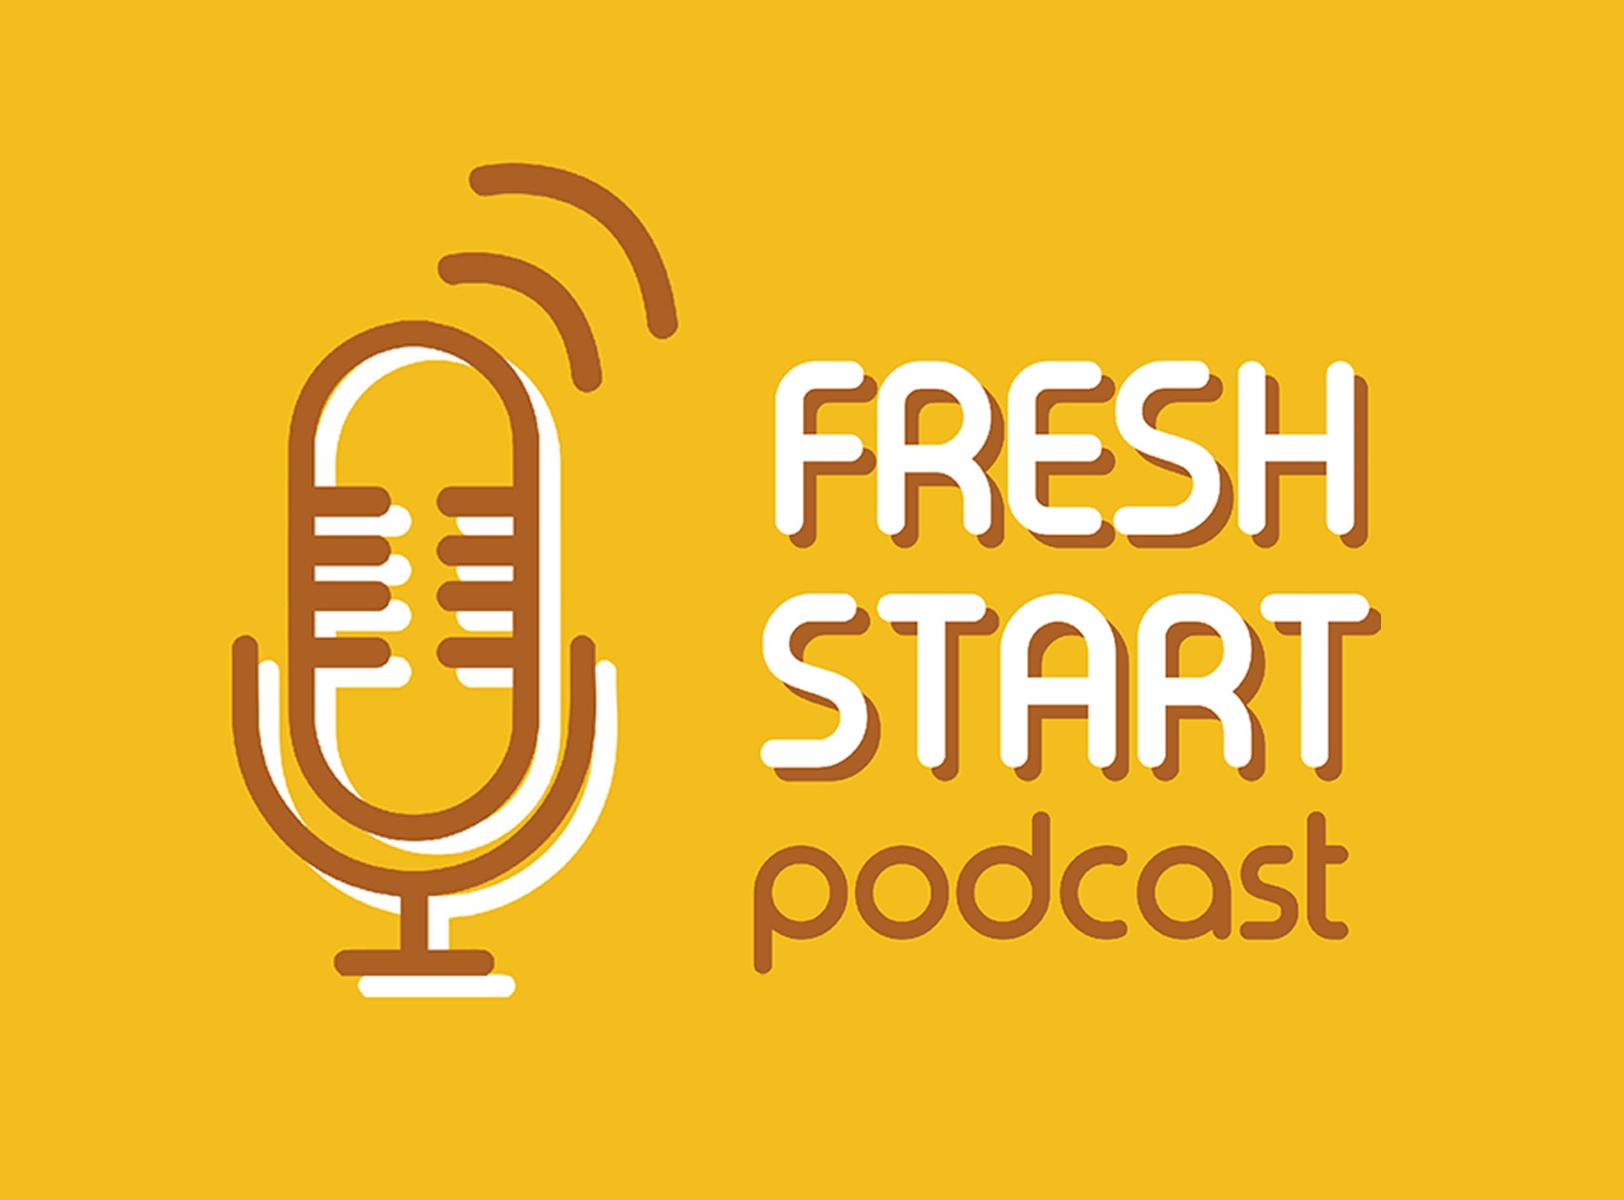 Fresh Start: Podcast News (3/30/2020 Mon.)